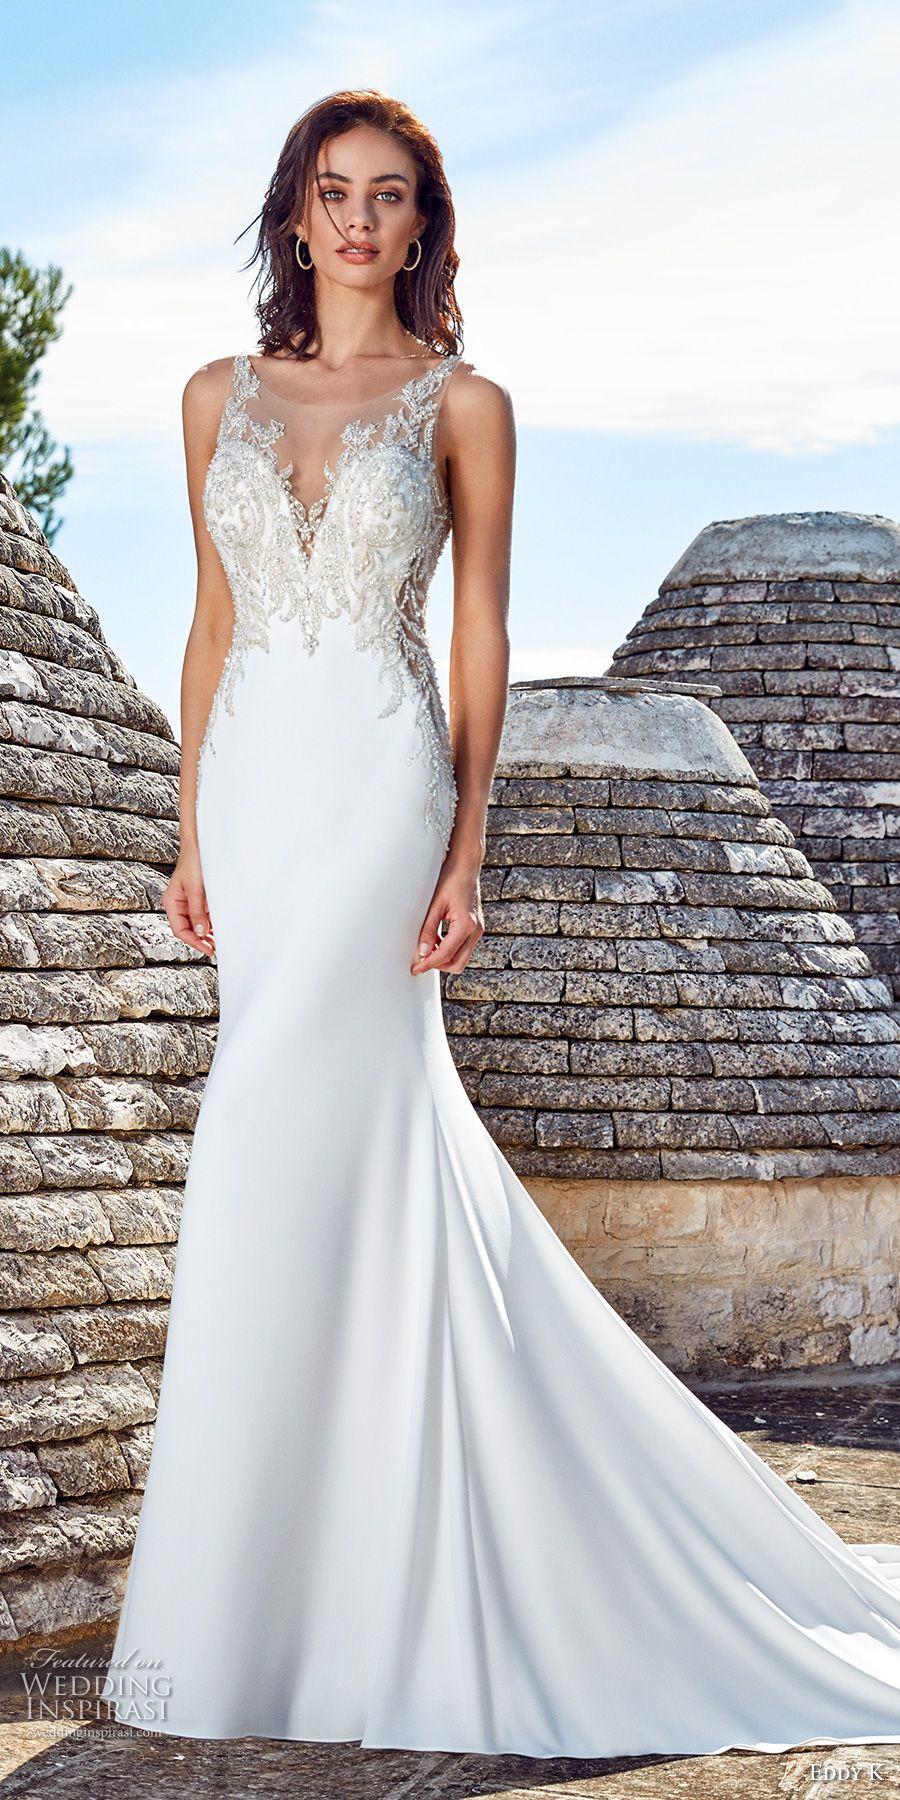 Eddy K. Dreams 2018 Wedding Dresses Wedding dresses